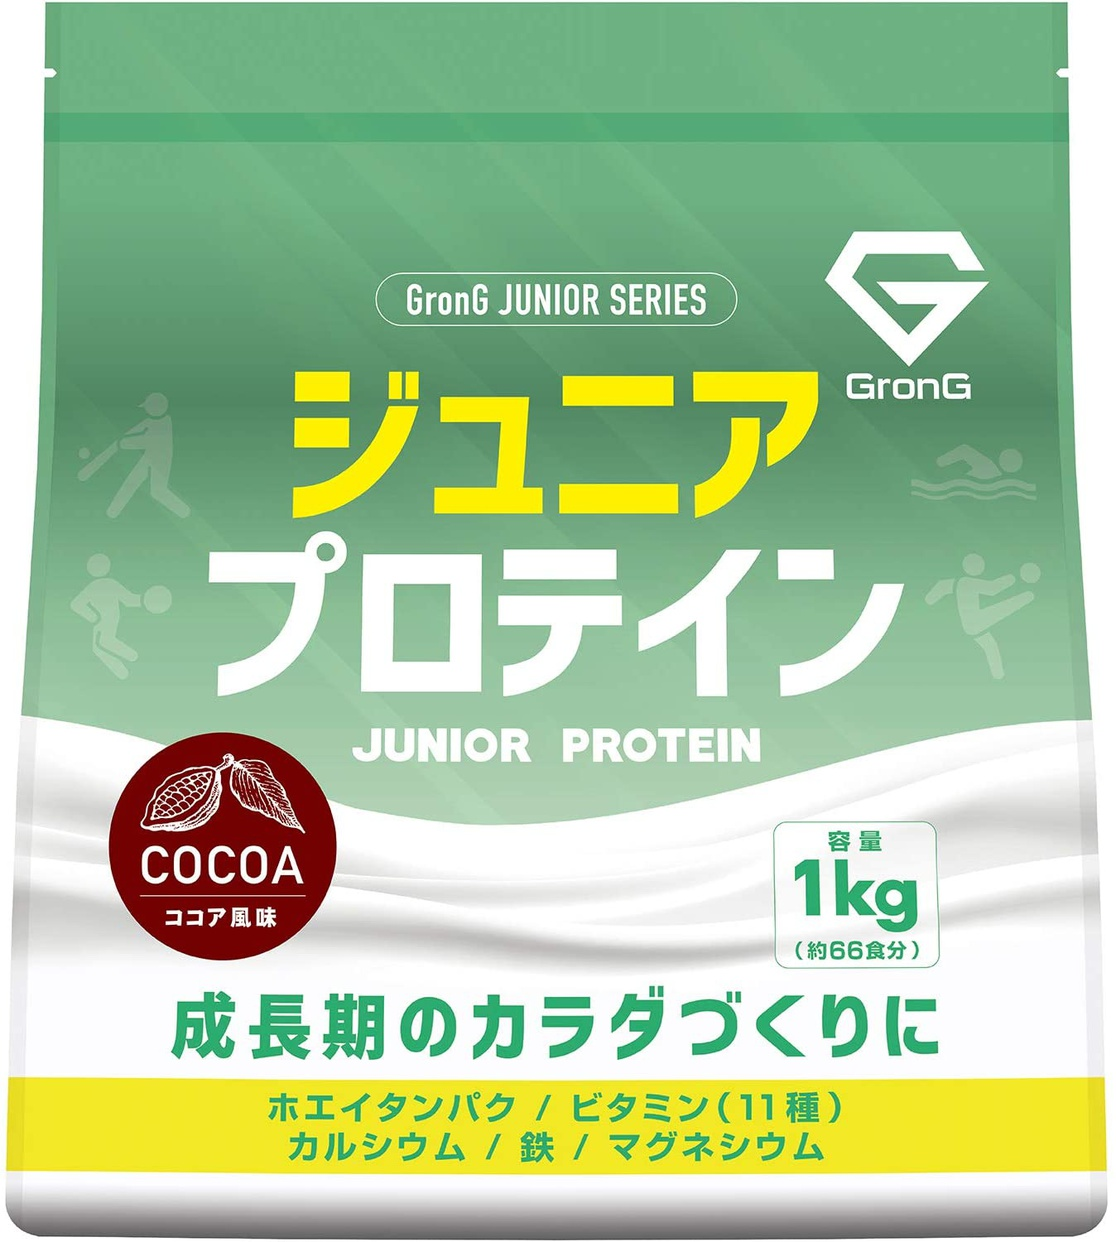 GronG(グロング) ジュニアプロテインの商品画像